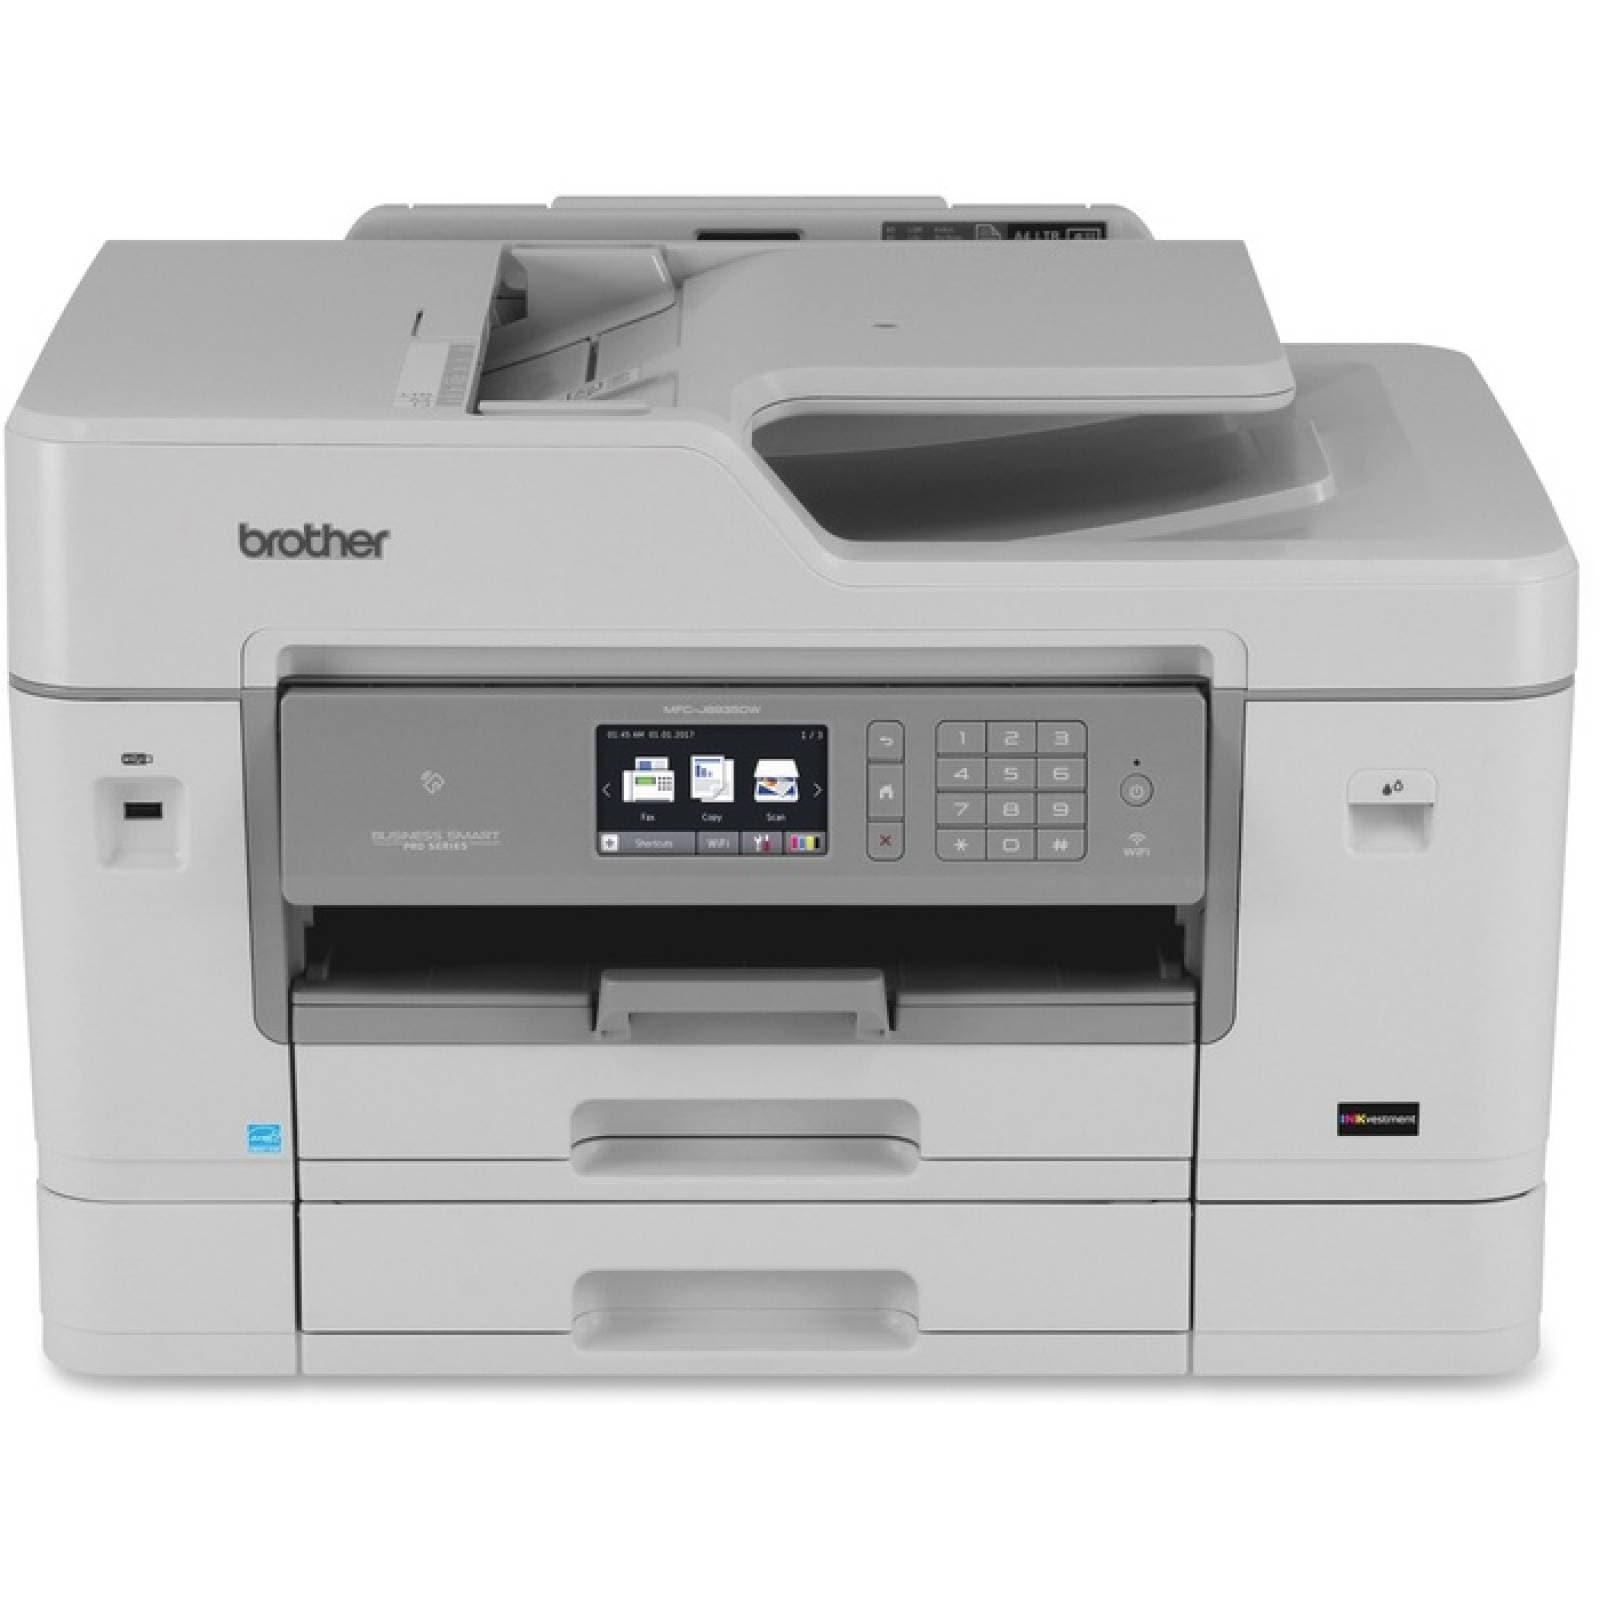 Impresora de inyeccin de tinta multifuncin Business Smart MFCJ6935DW